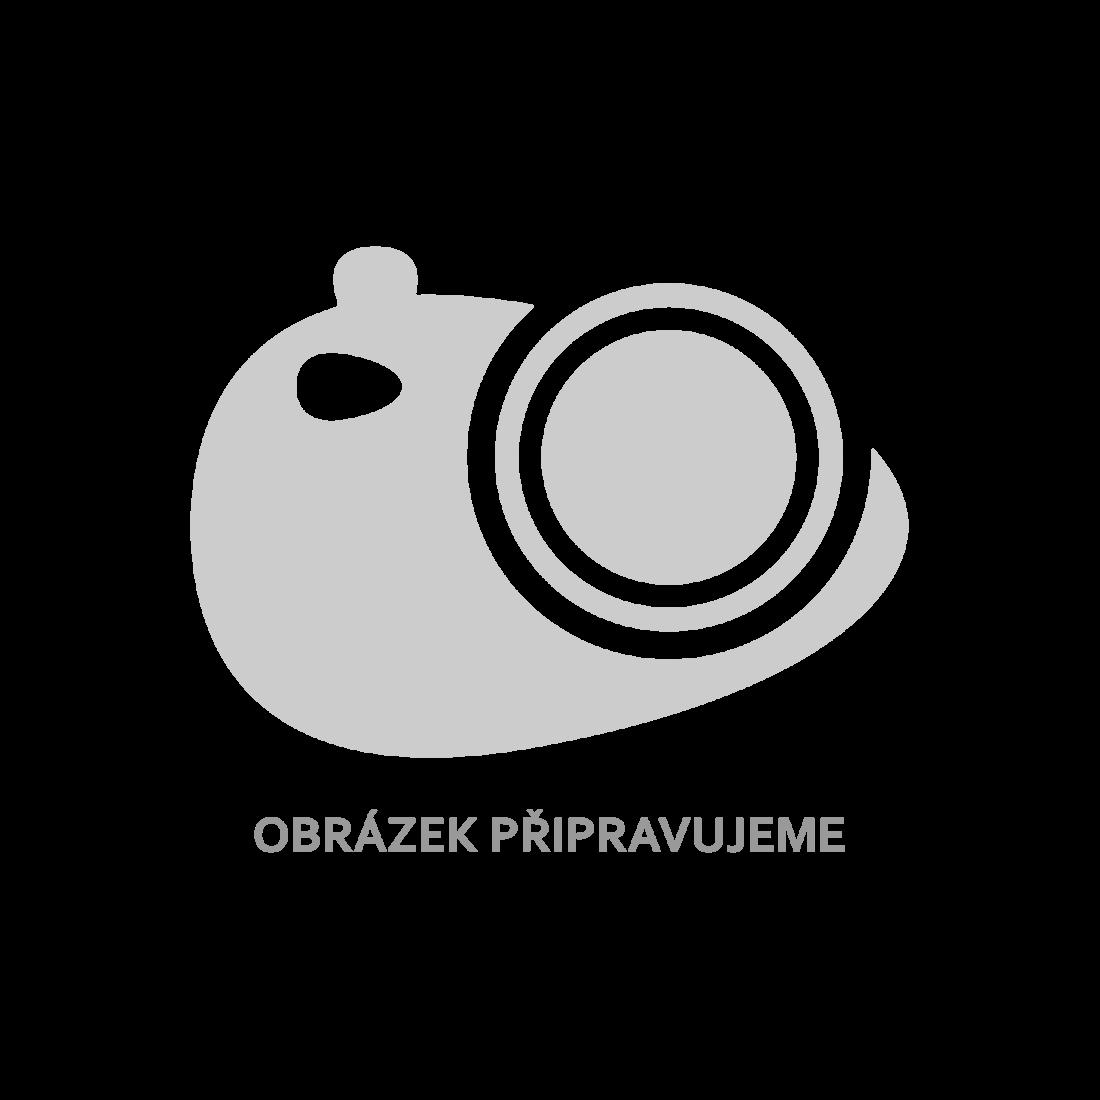 vidaXL Nástěnná police na CD bílá 75 x 18 x 18 cm dřevotříska [801310]